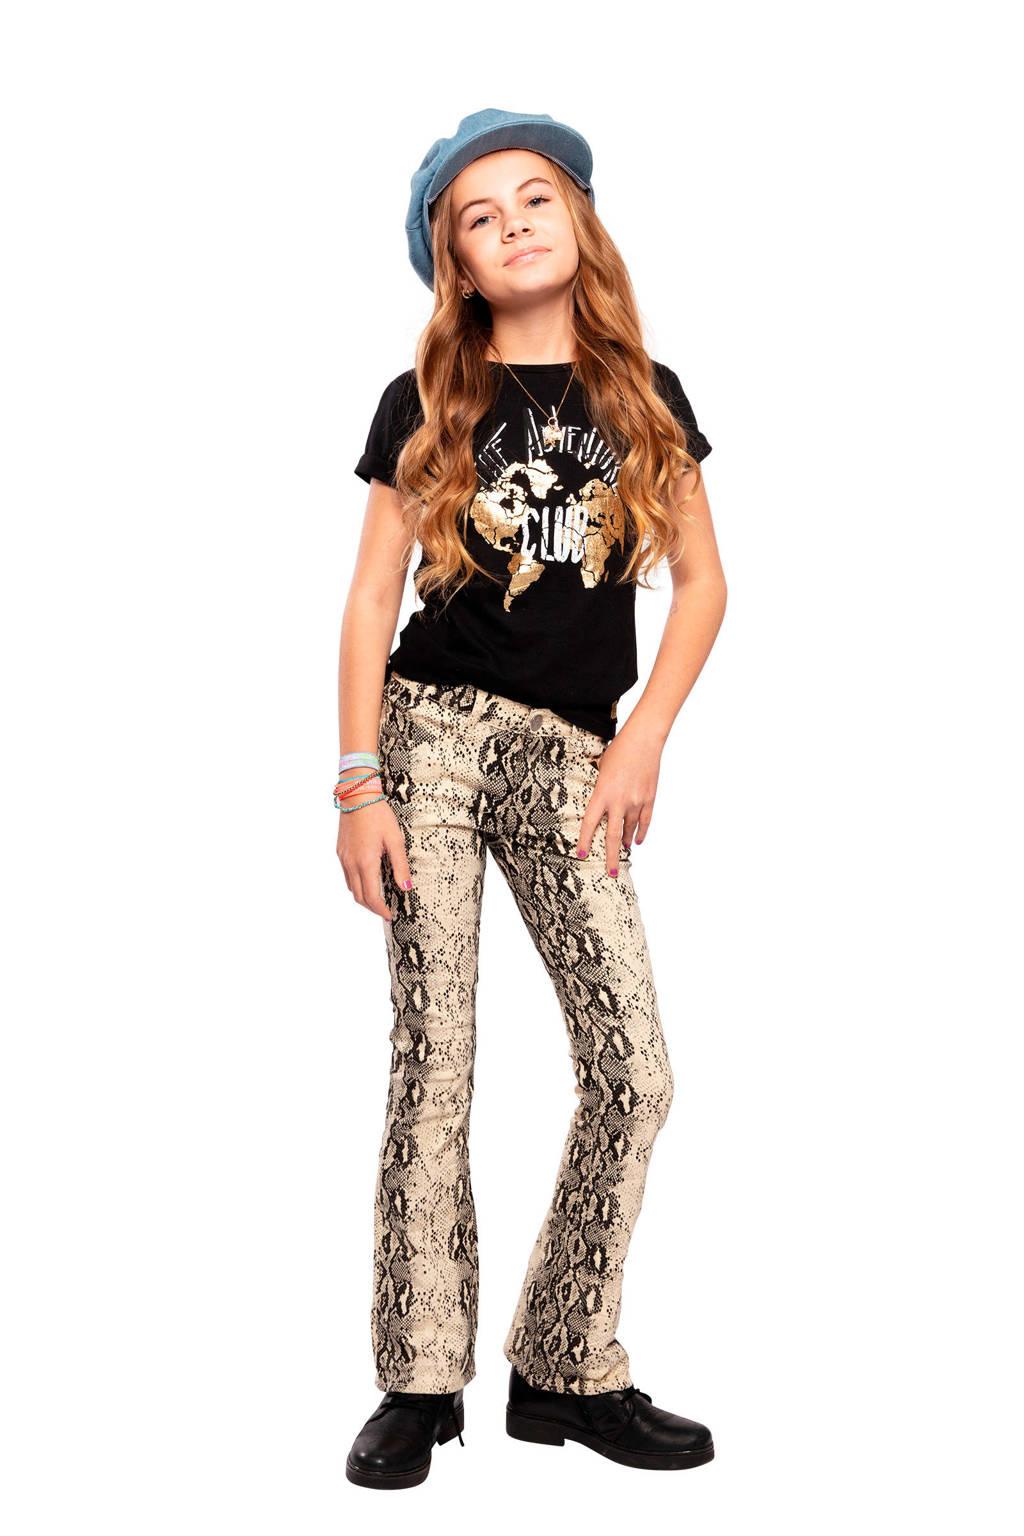 Indian Blue Jeans T-shirt met printopdruk zwart/wit/goud, Zwart/wit/goud